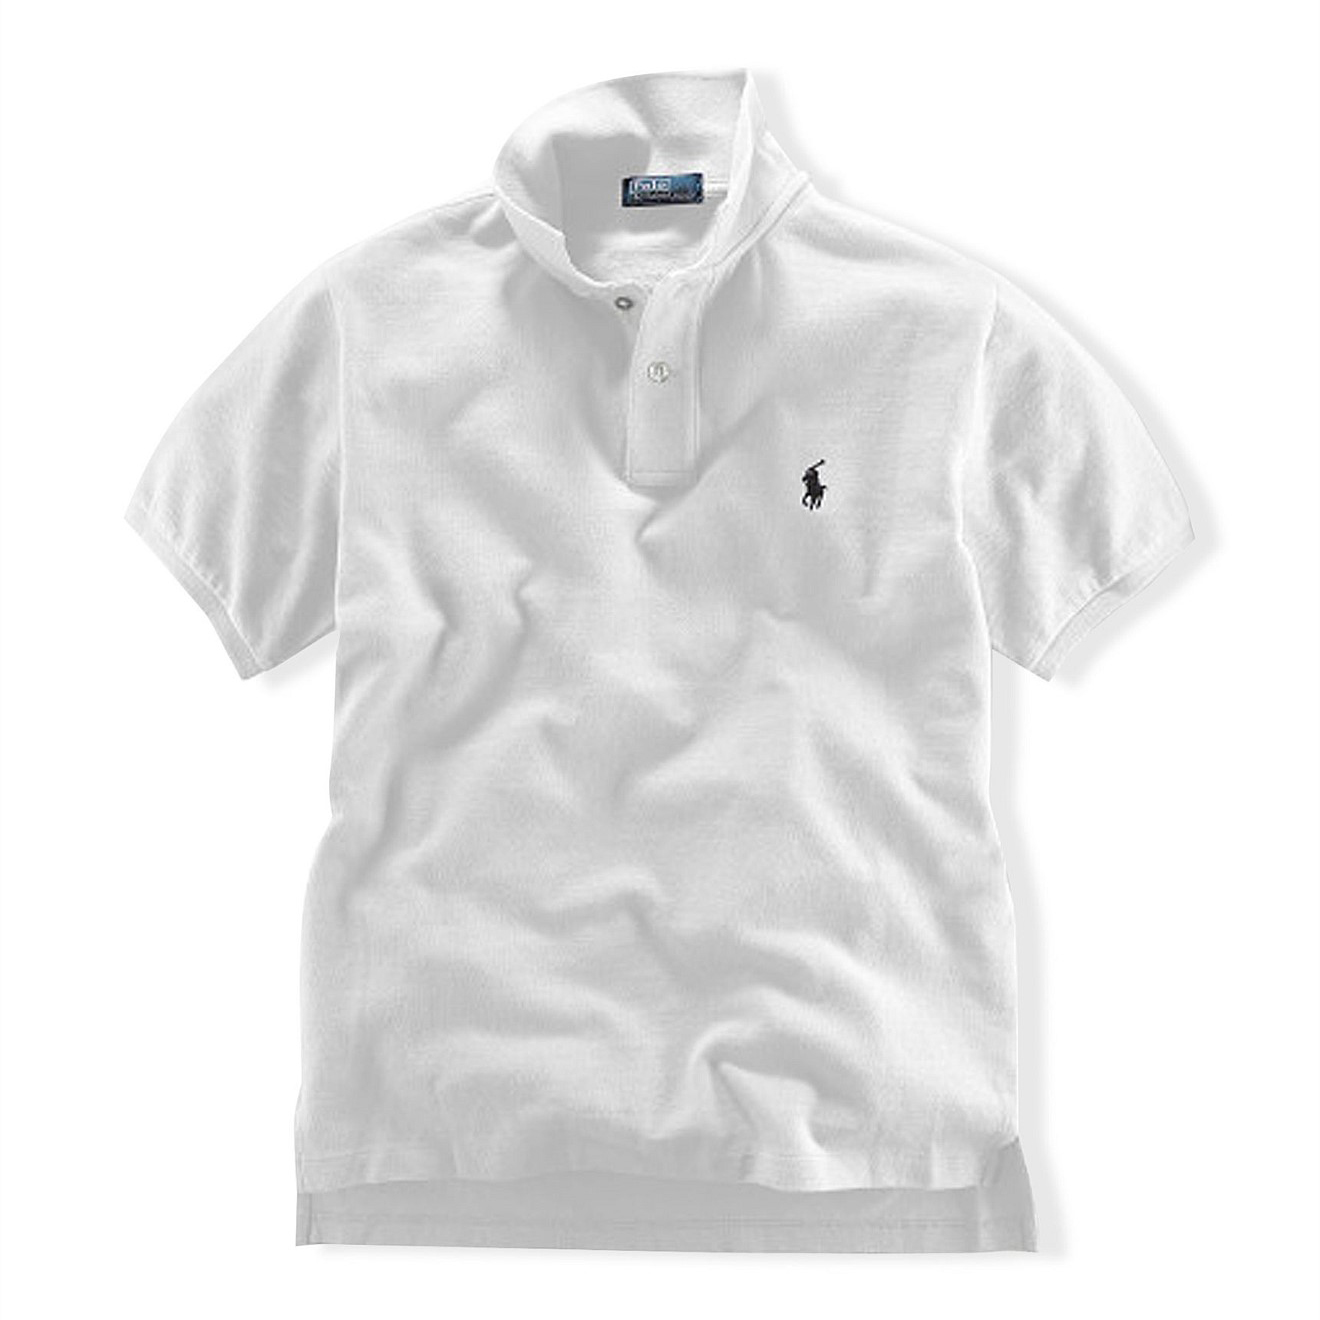 Polo Ralph Lauren Cotton Mesh Polo Shirt -Kids